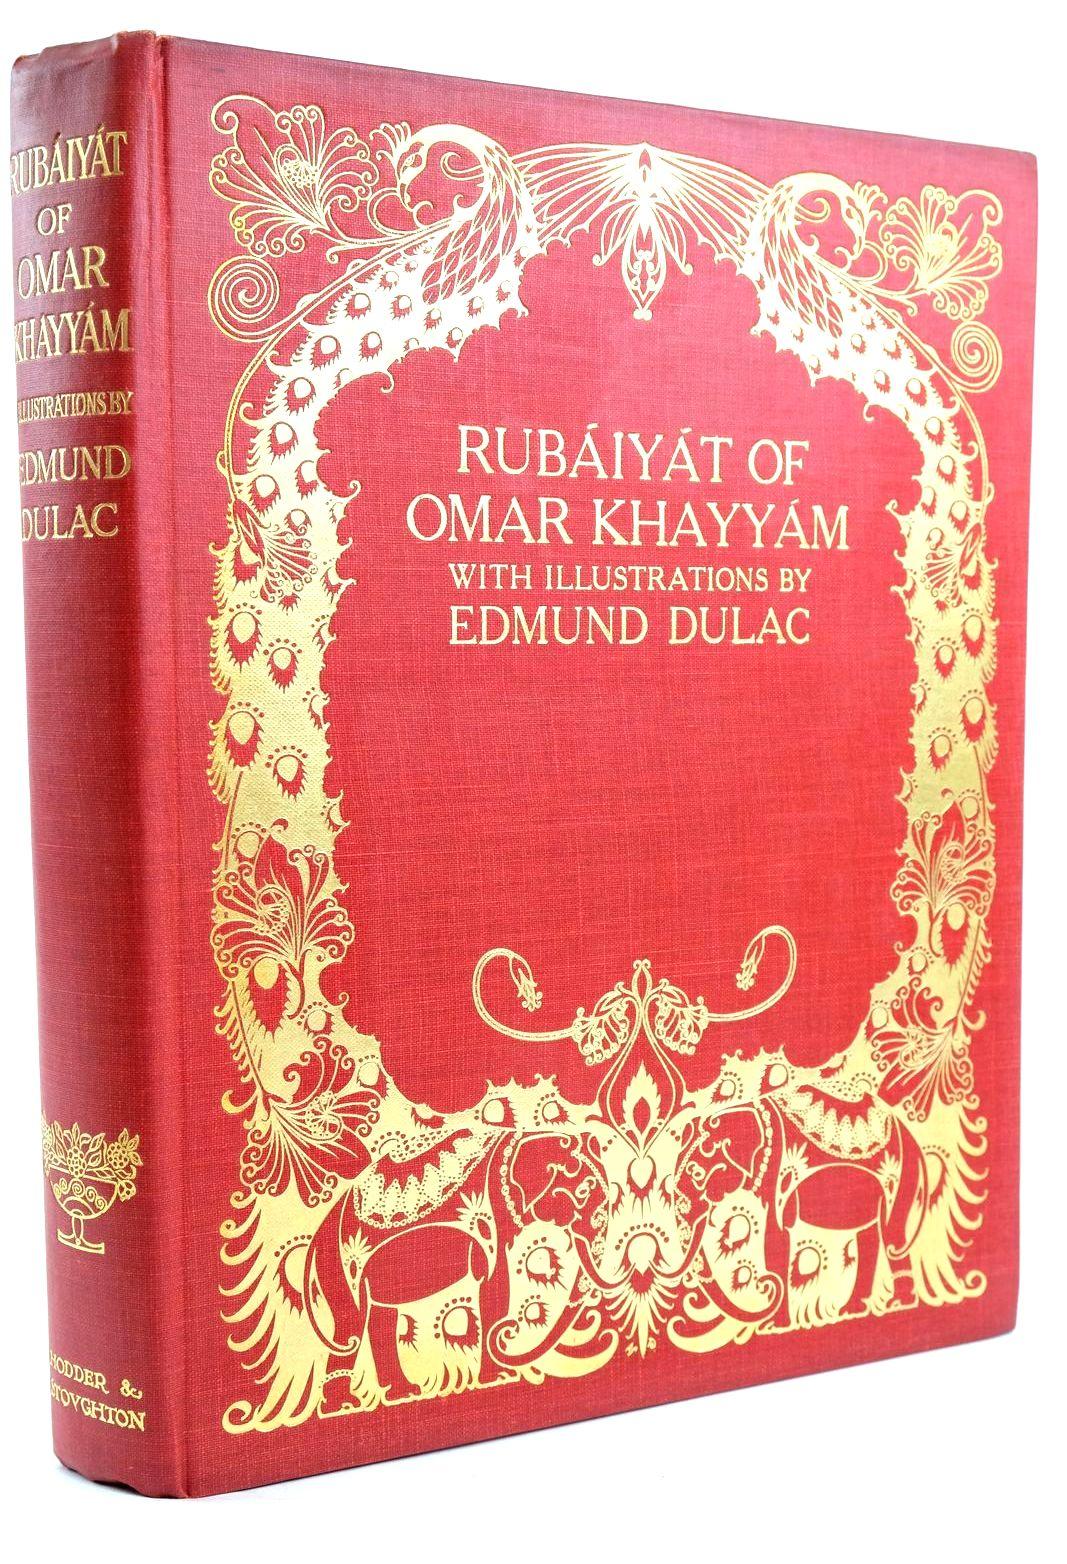 Photo of RUBAIYAT OF OMAR KHAYYAM written by Khayyam, Omar Fitzgerald, Edward illustrated by Dulac, Edmund published by Hodder & Stoughton (STOCK CODE: 1319525)  for sale by Stella & Rose's Books